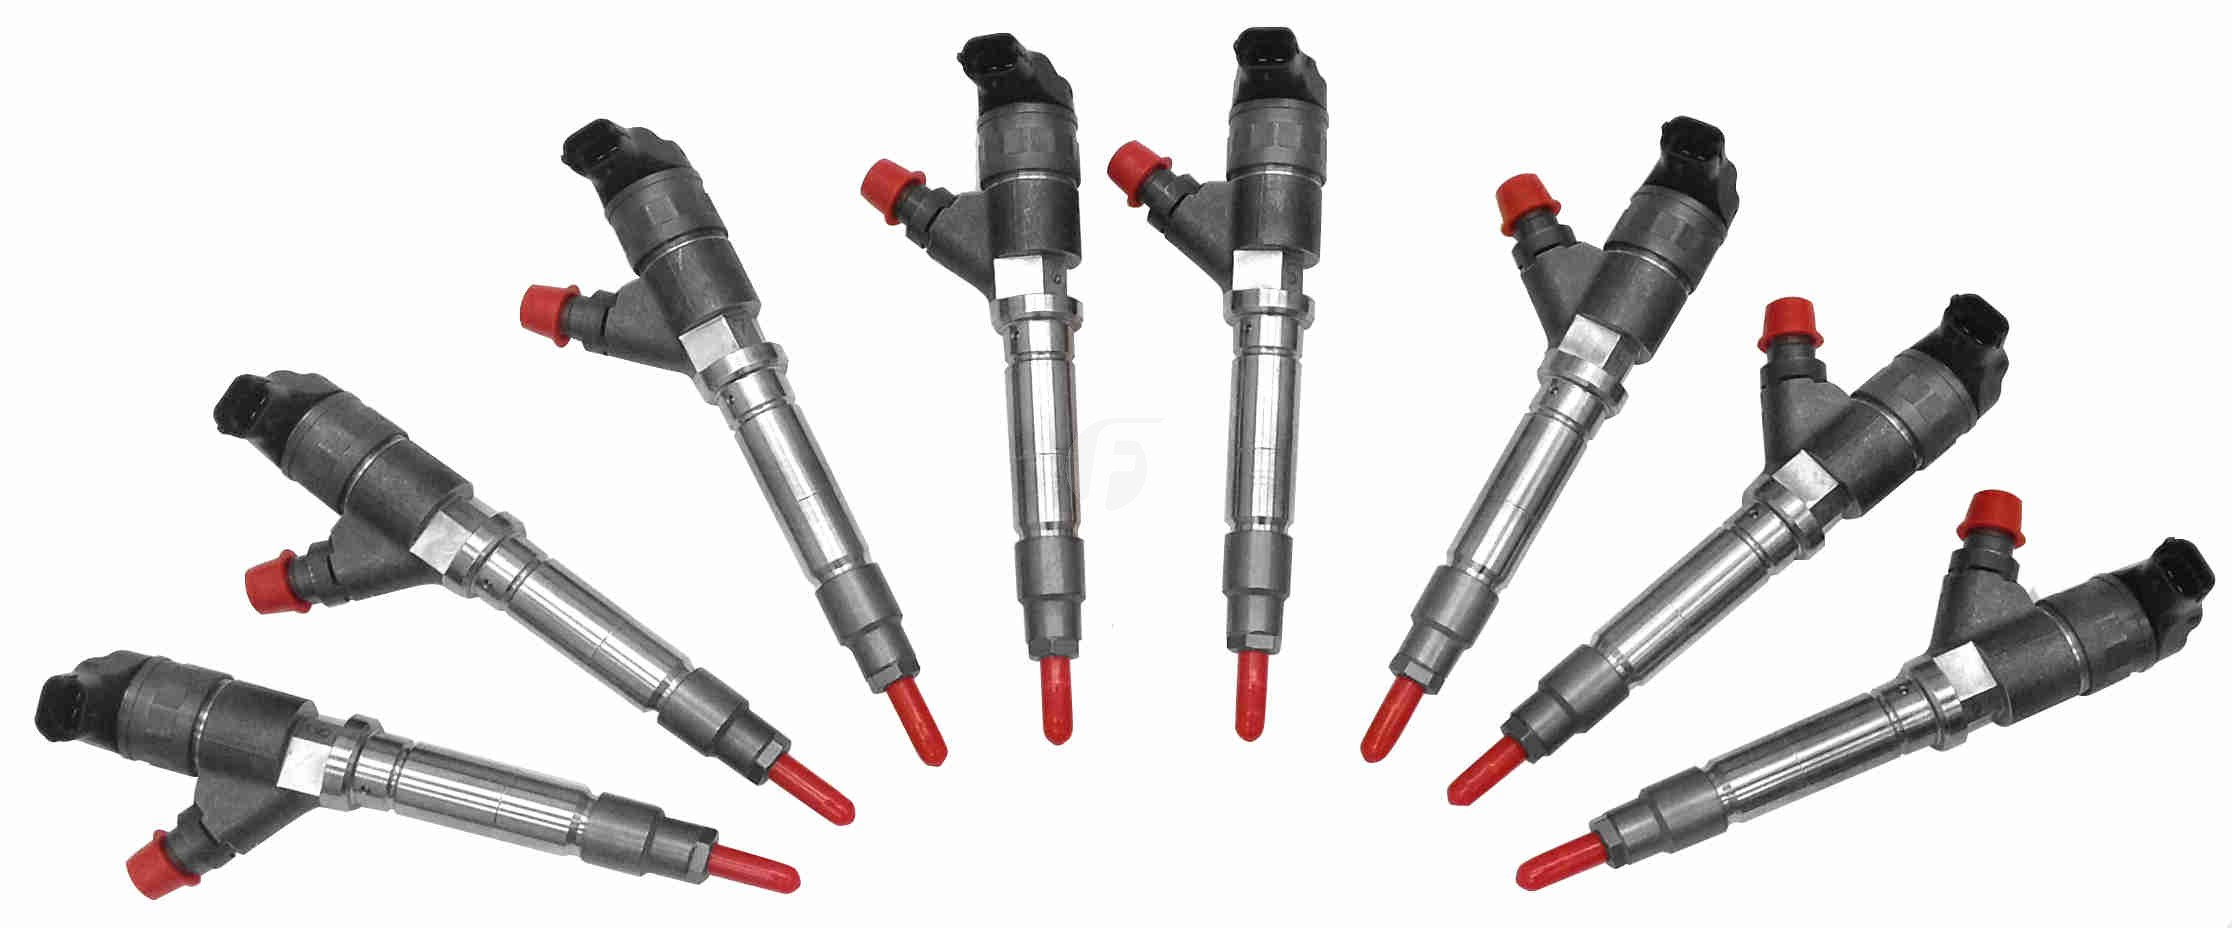 New Fleece Performance Lml Duramax Injectors Rlc Motorsports Lb7 Injector Wiring Diagram